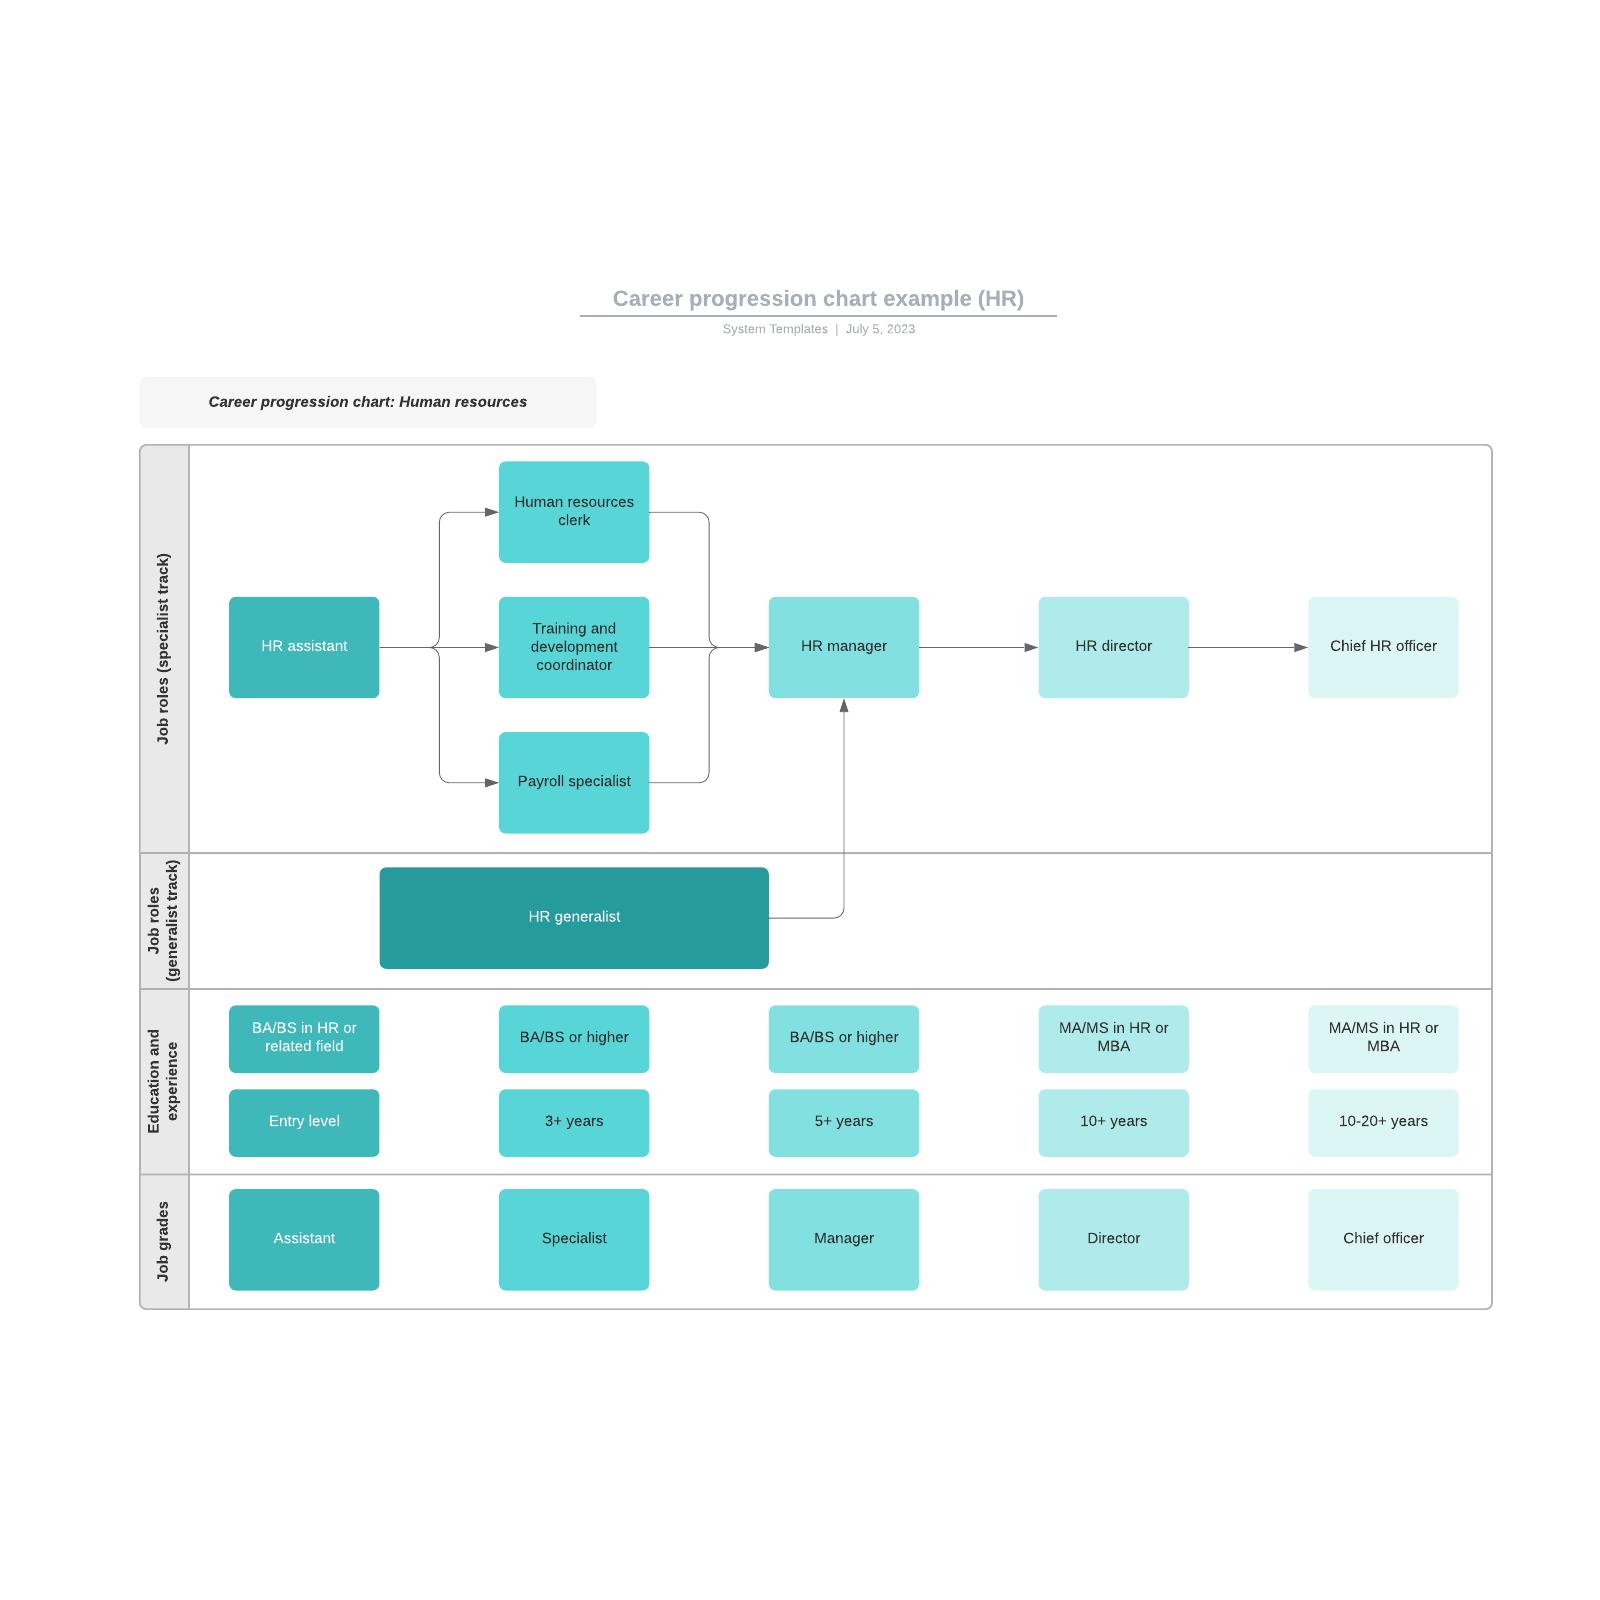 Career progression chart example (HR)